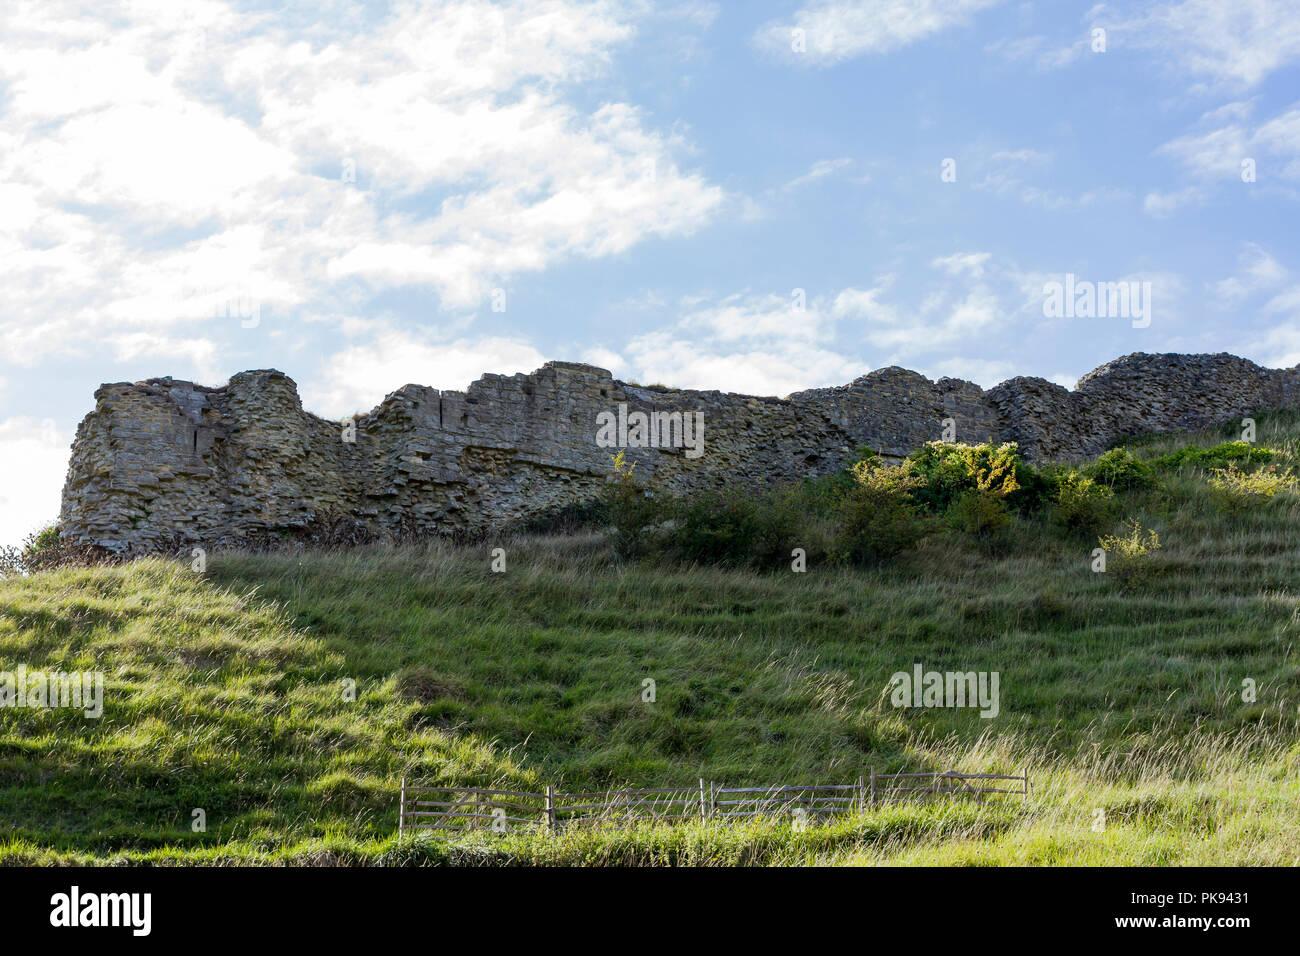 Corfe Castle ruins seen from the public road below, Dorset, UK - Stock Image